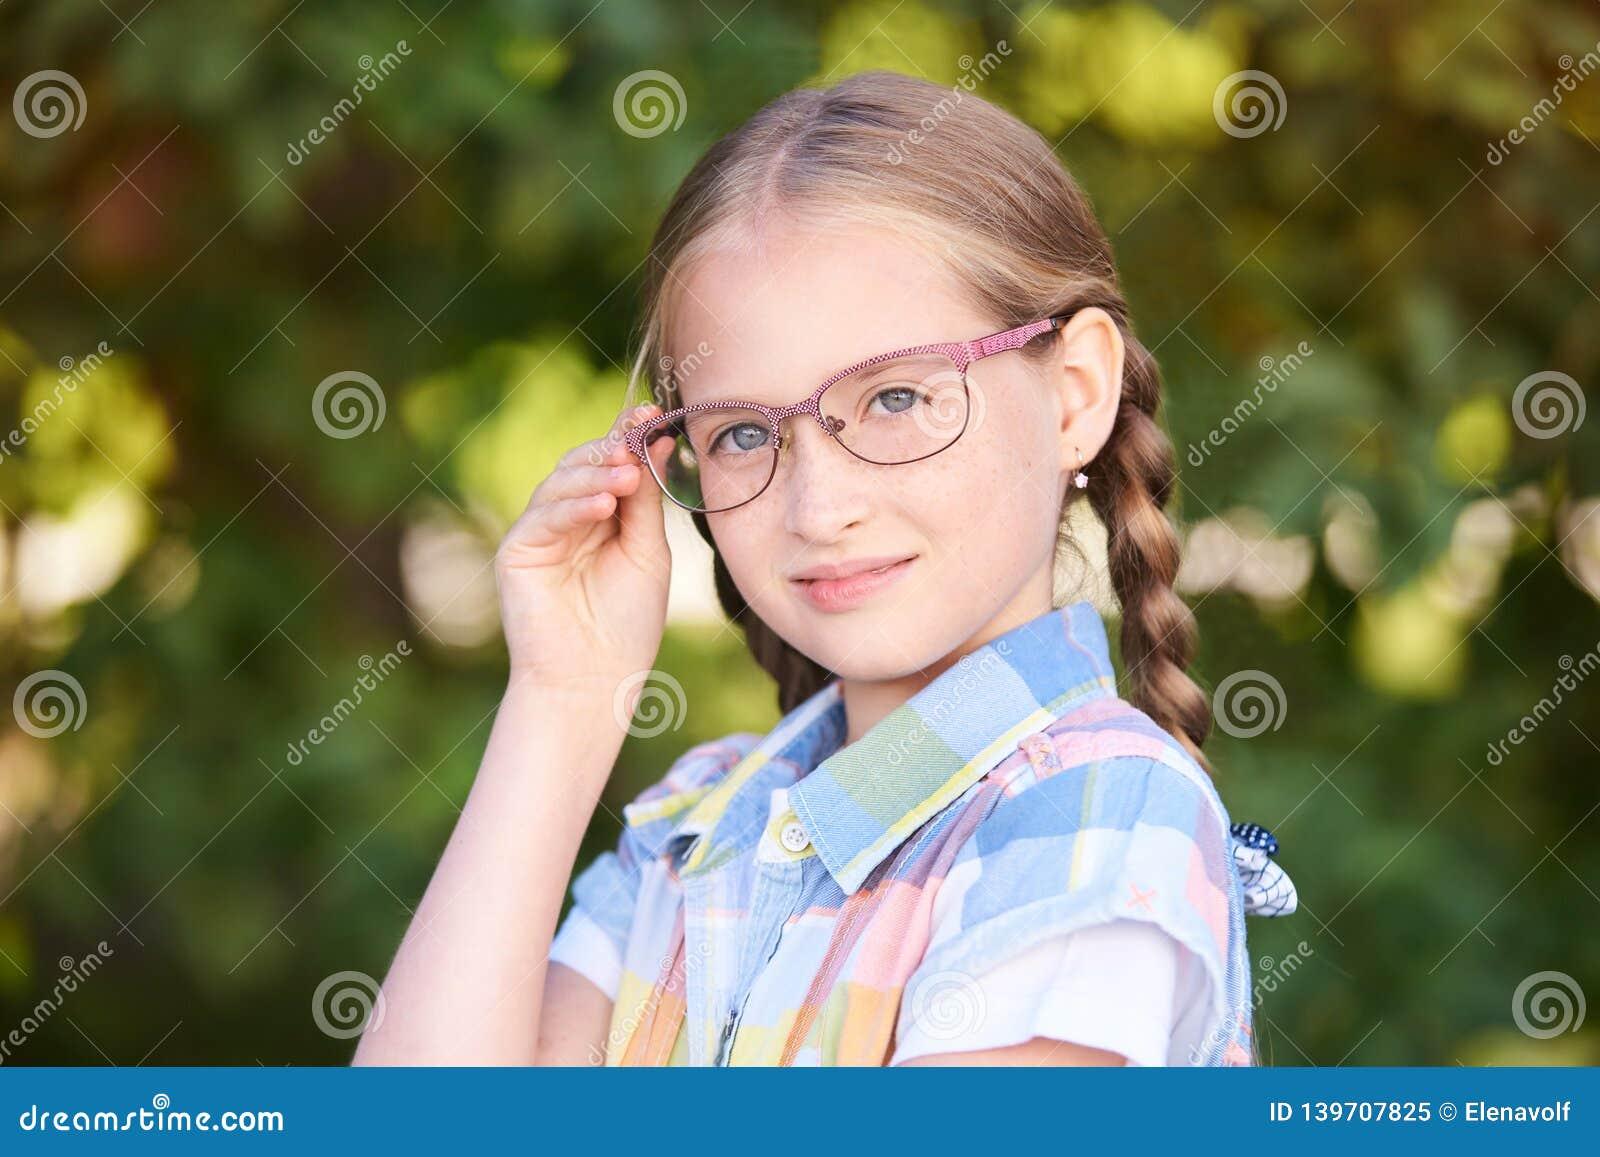 Casual schoolchildren. Little girl smile. Standind outdoor with eyeglasses. First grade